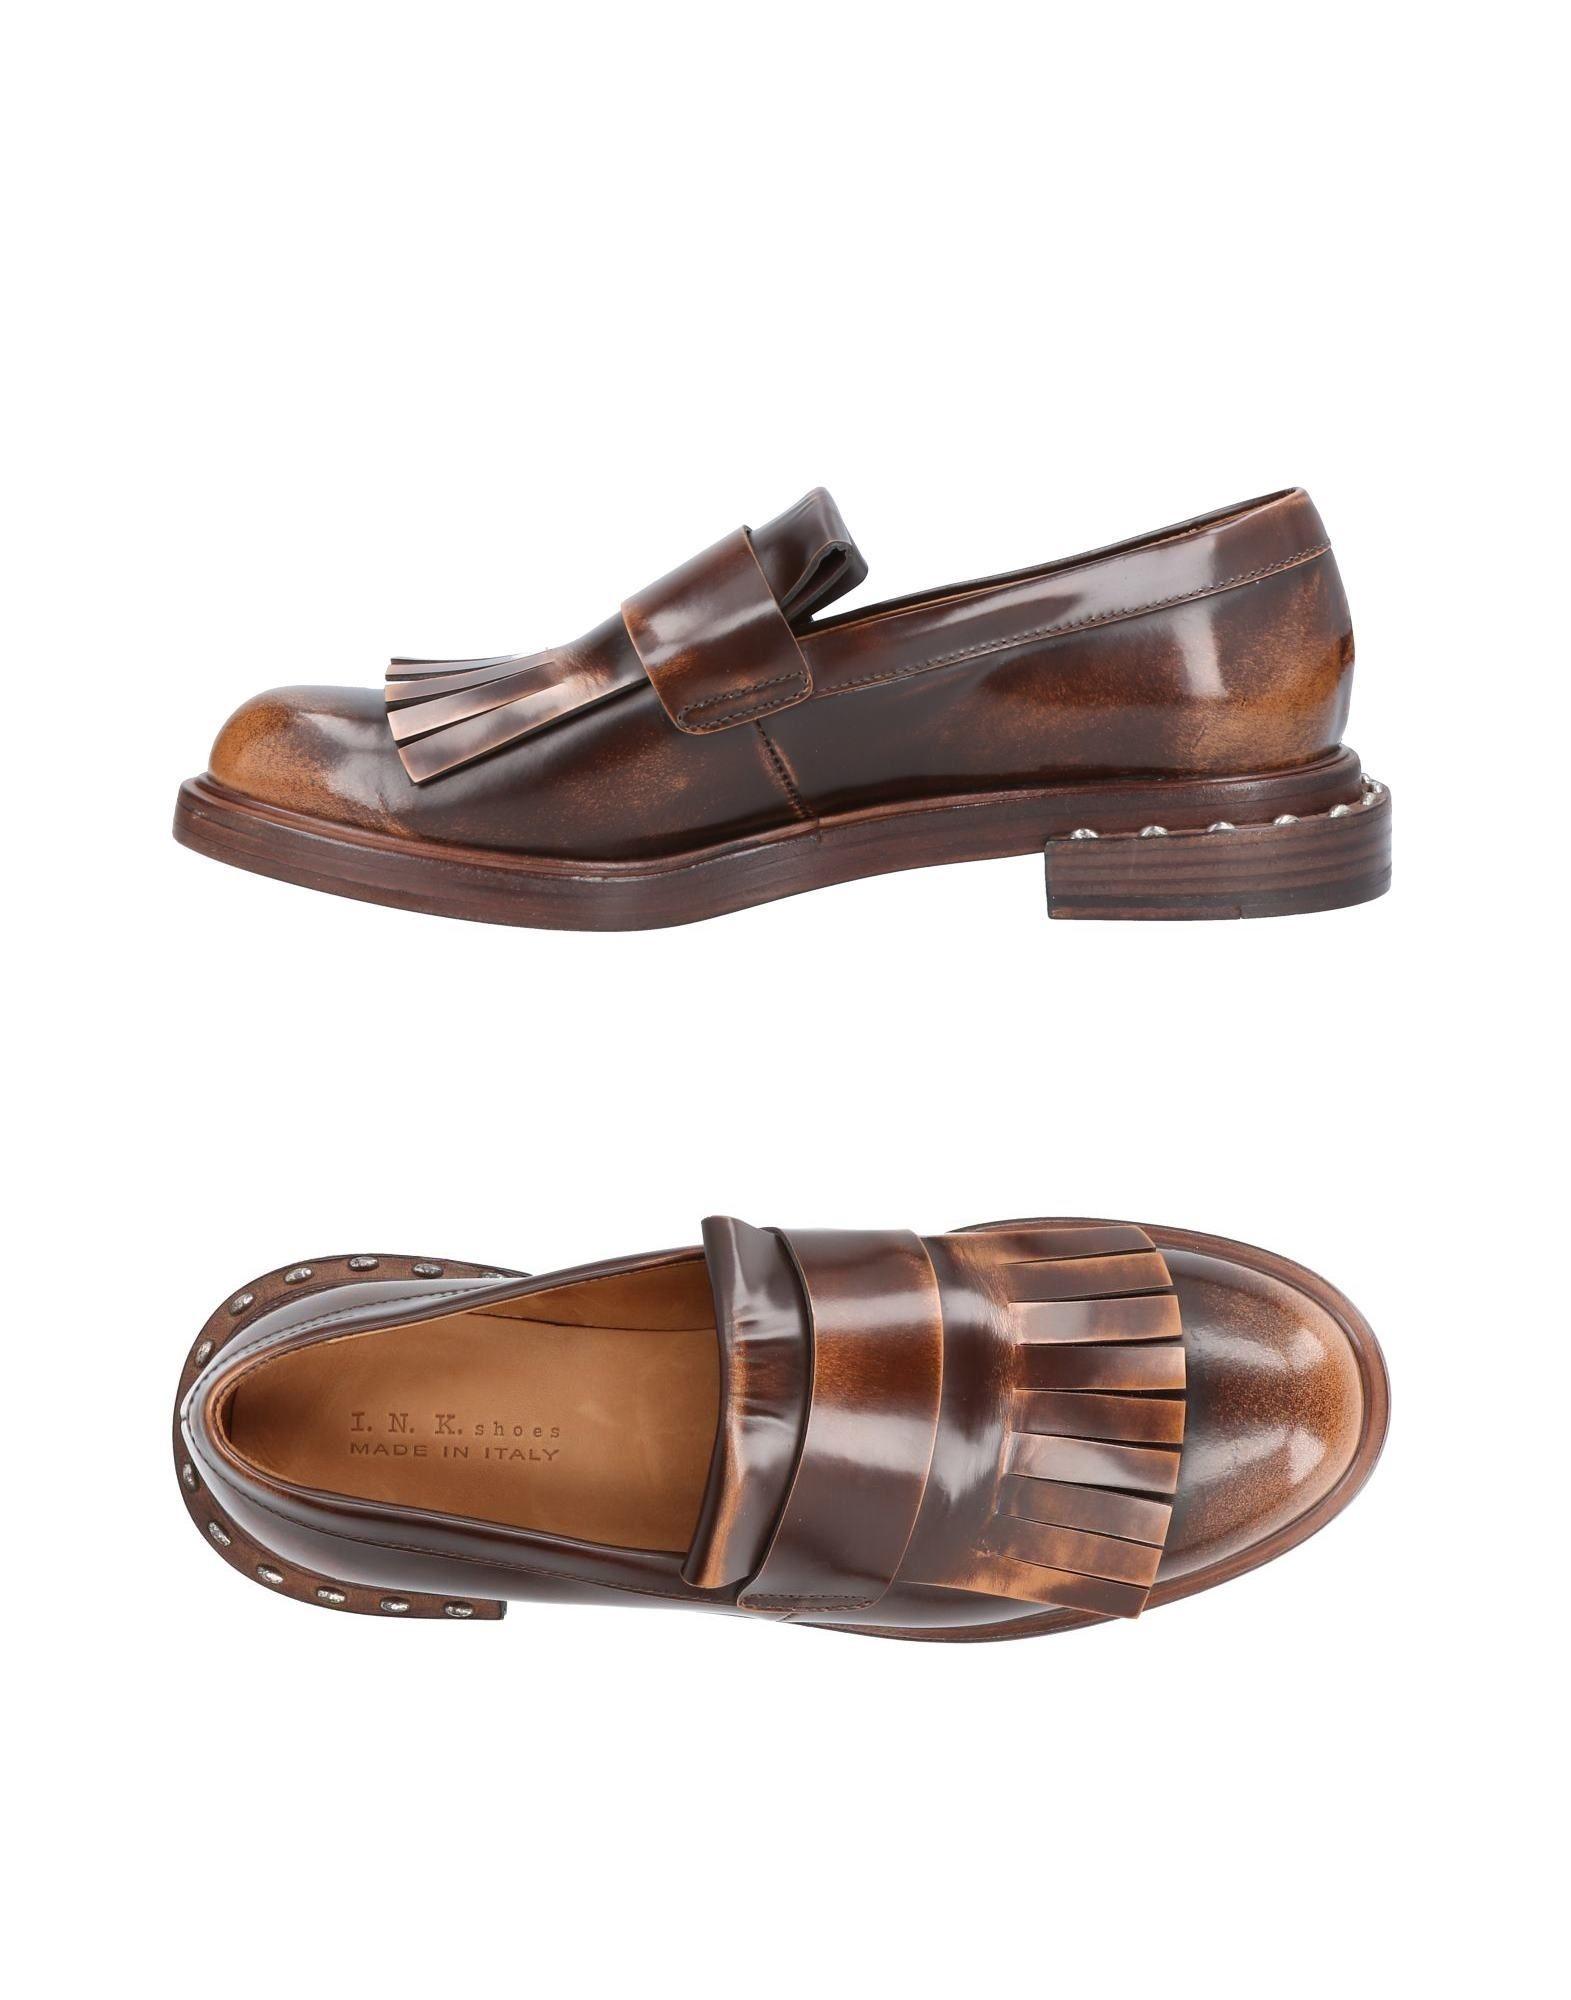 I.N.K. Shoes レディース モカシン ダークブラウン 36 革